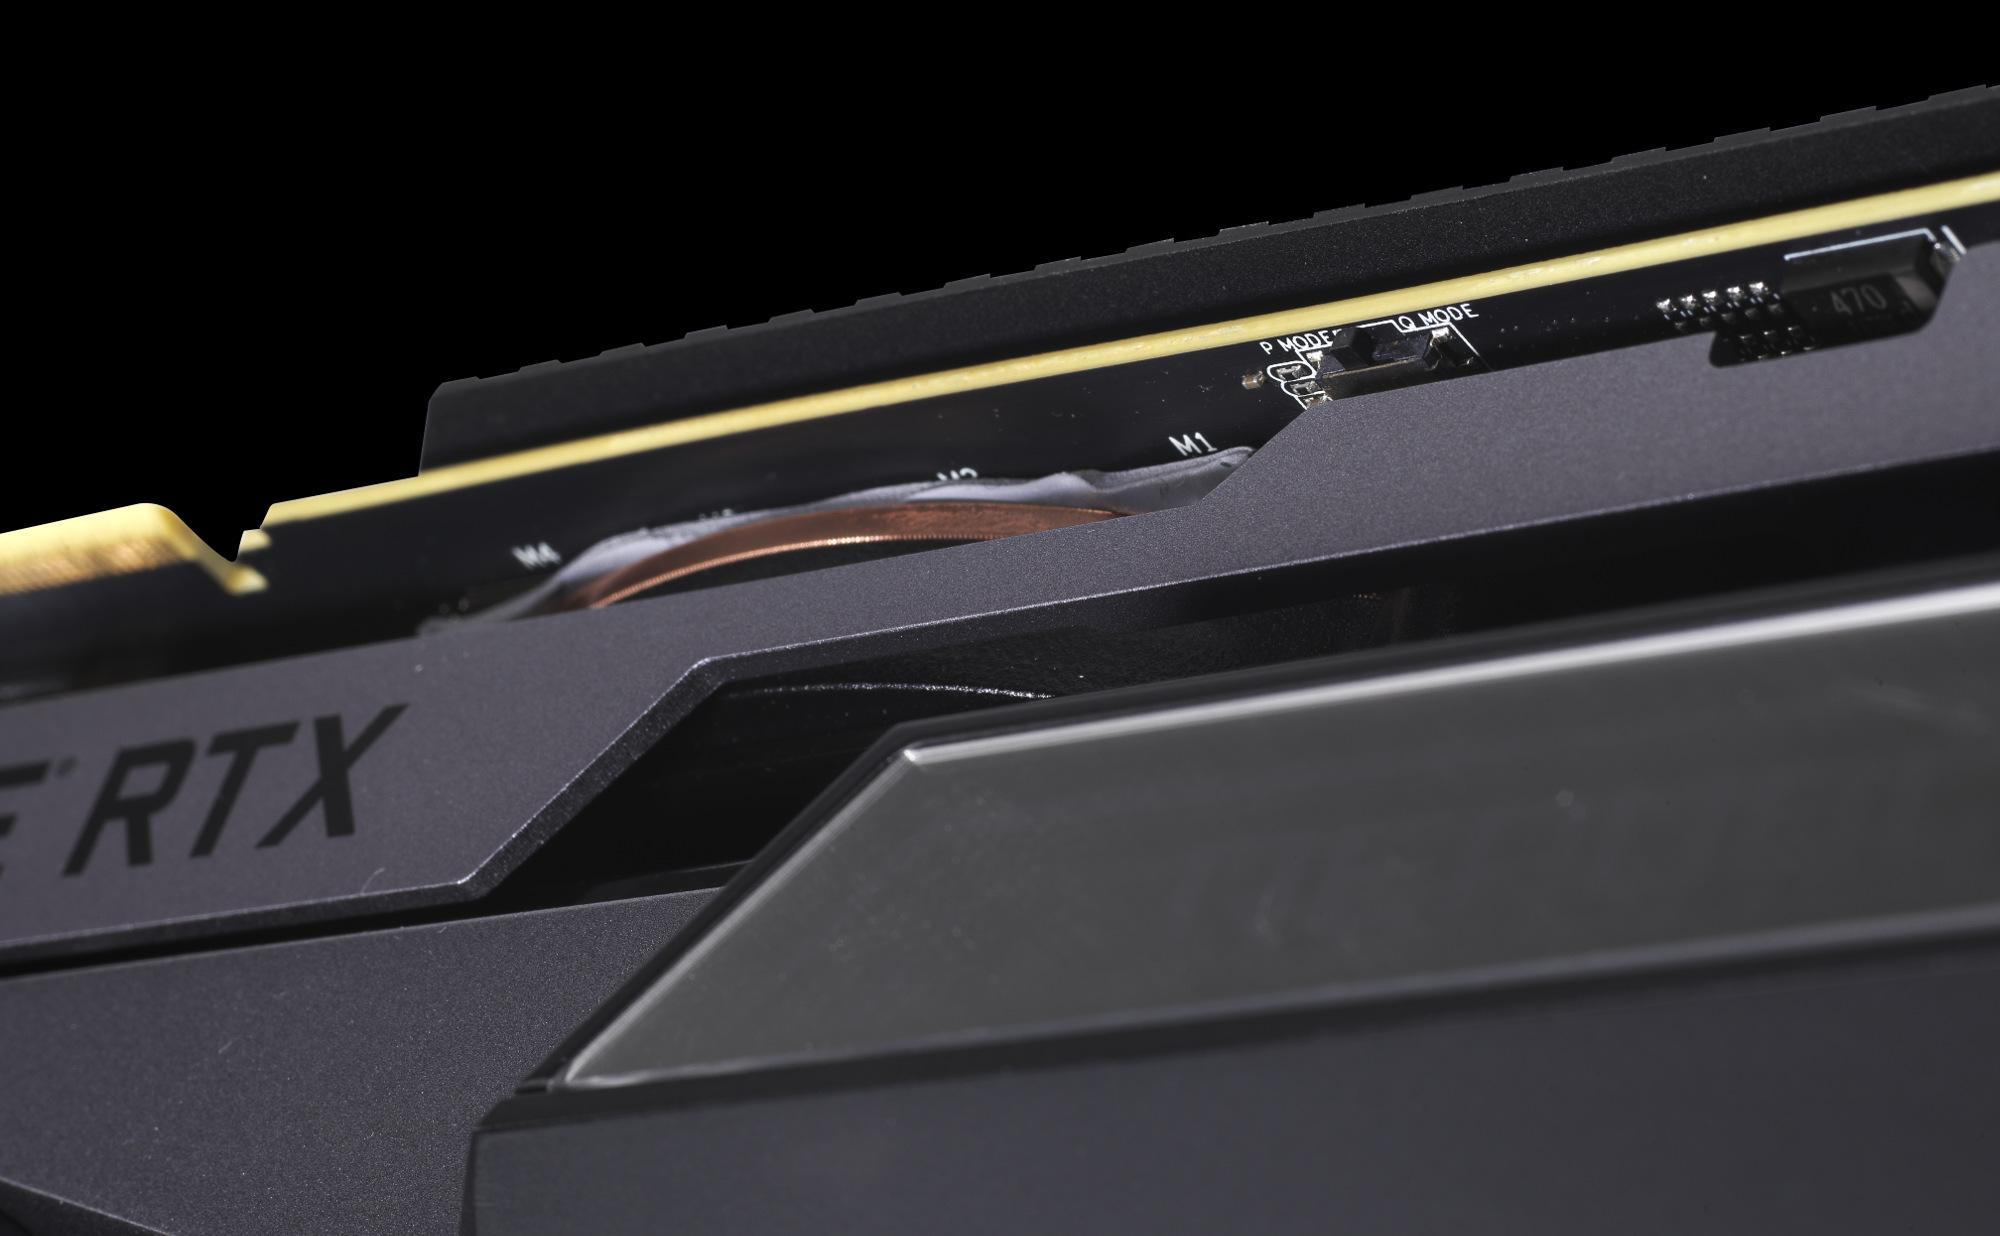 The ROG Matrix RTX 2080 Ti fully integrates liquid GPU cooling | ROG